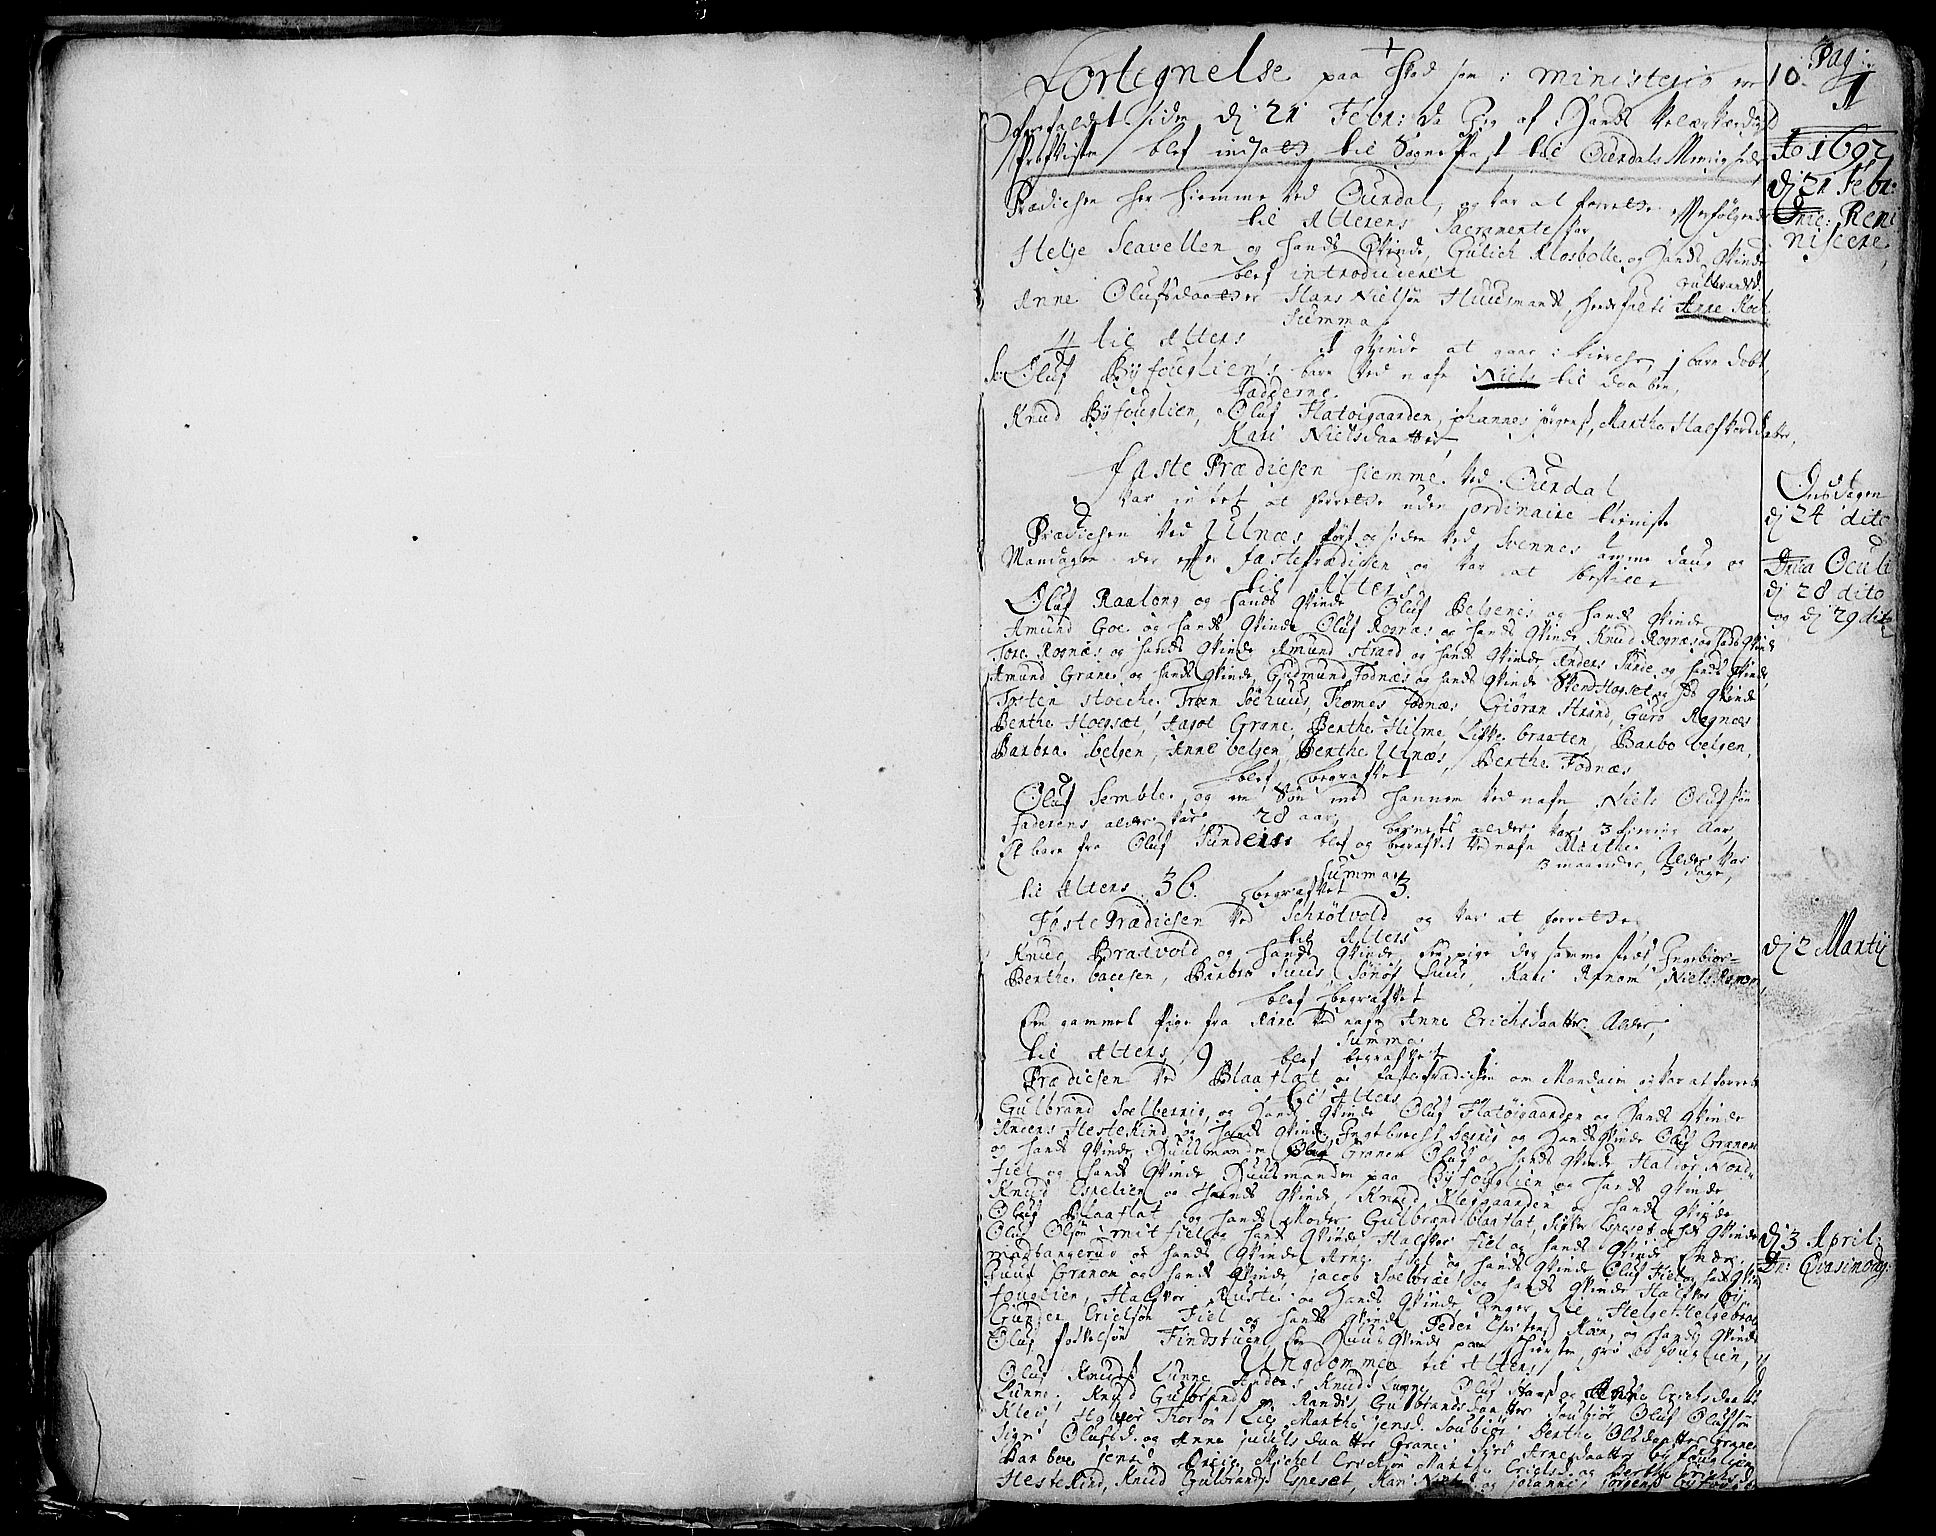 SAH, Aurdal prestekontor, Ministerialbok nr. 1-3, 1692-1730, s. 10